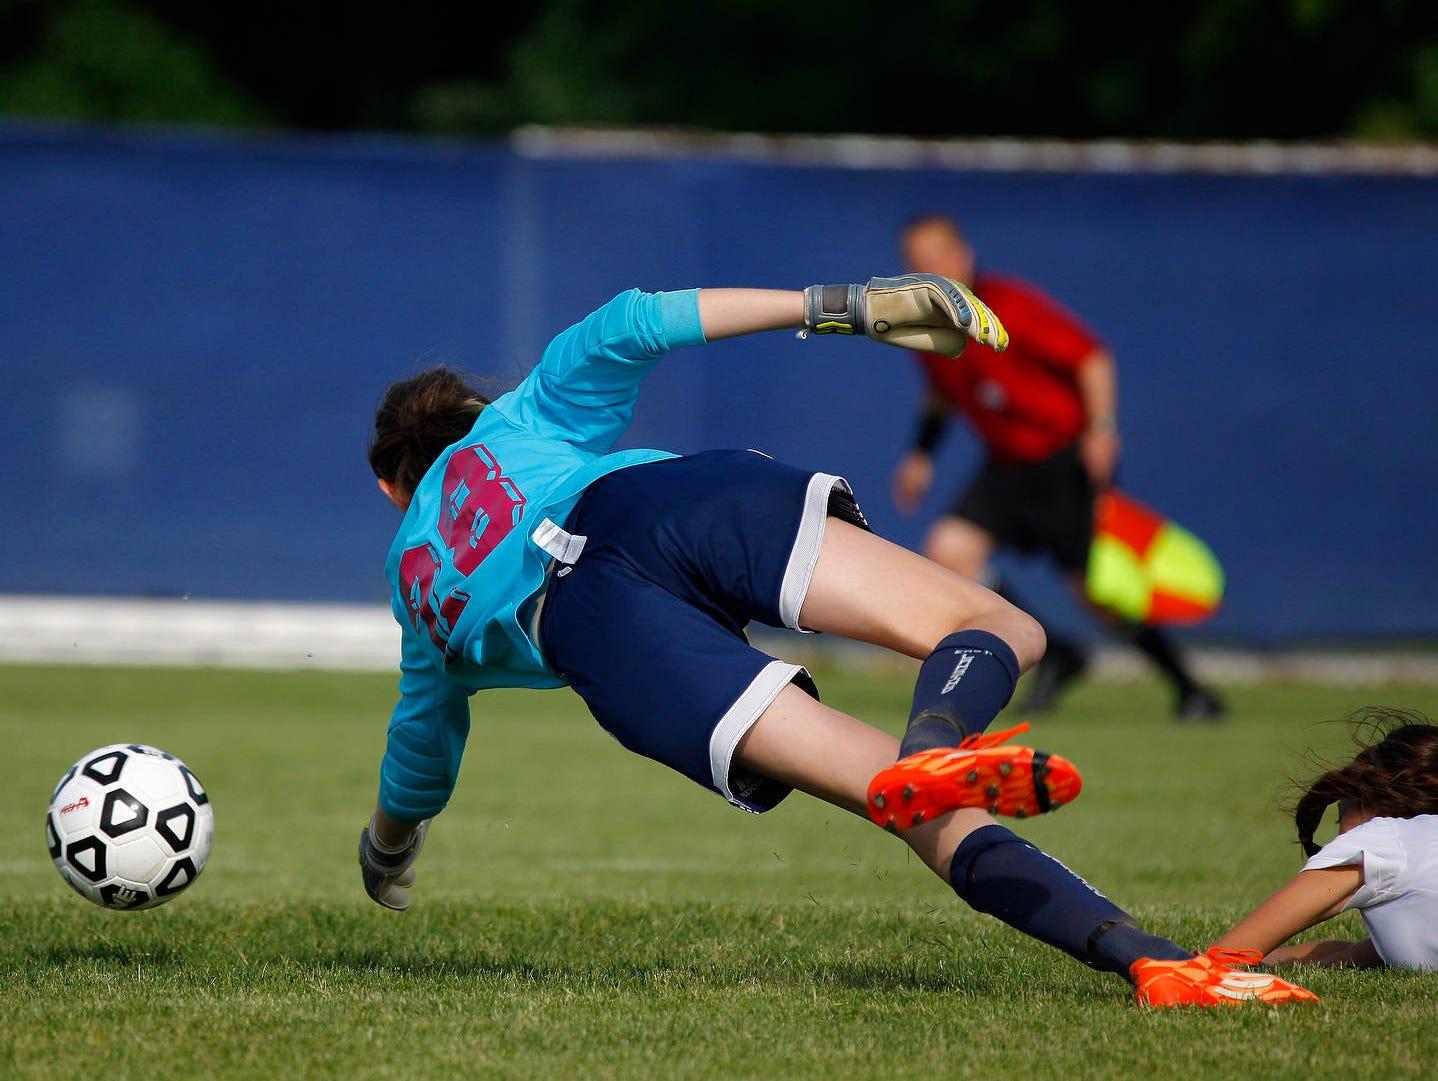 St. Johns' Lexi McPherson, right, gets the ball past East Lansing goalkeeper Madeline Chomentowski for St. Johns' first goal Thursday, June 2, 2016, at DeWitt High School. St. Johns won 4-0.